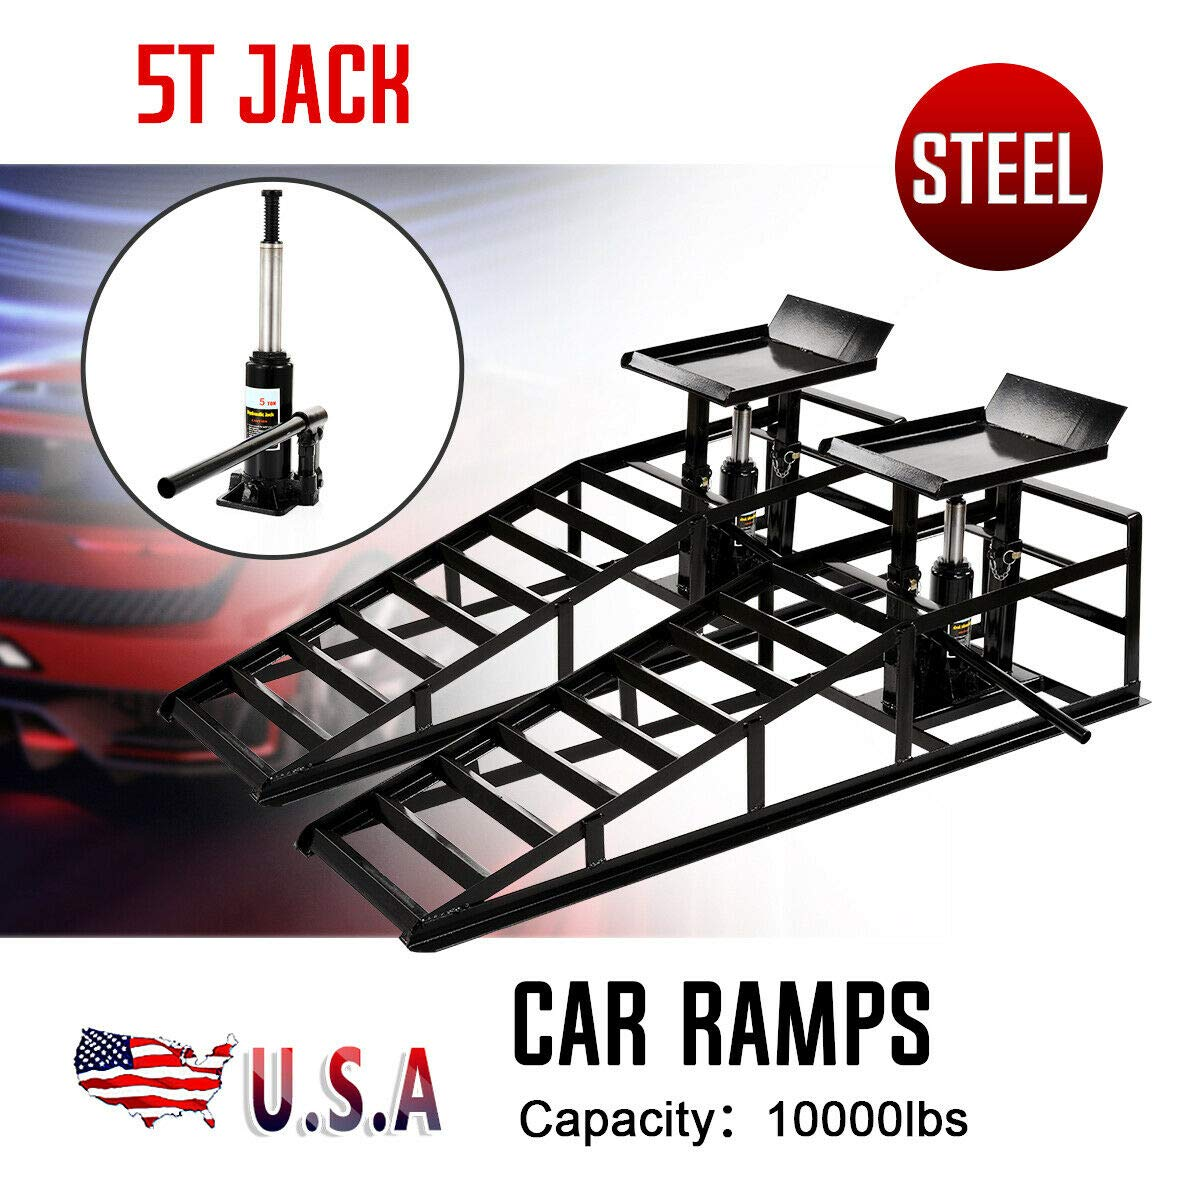 Vehicle Ramp Car Truck Repair Shop Garage Portable Automotive Service Ramps Pair